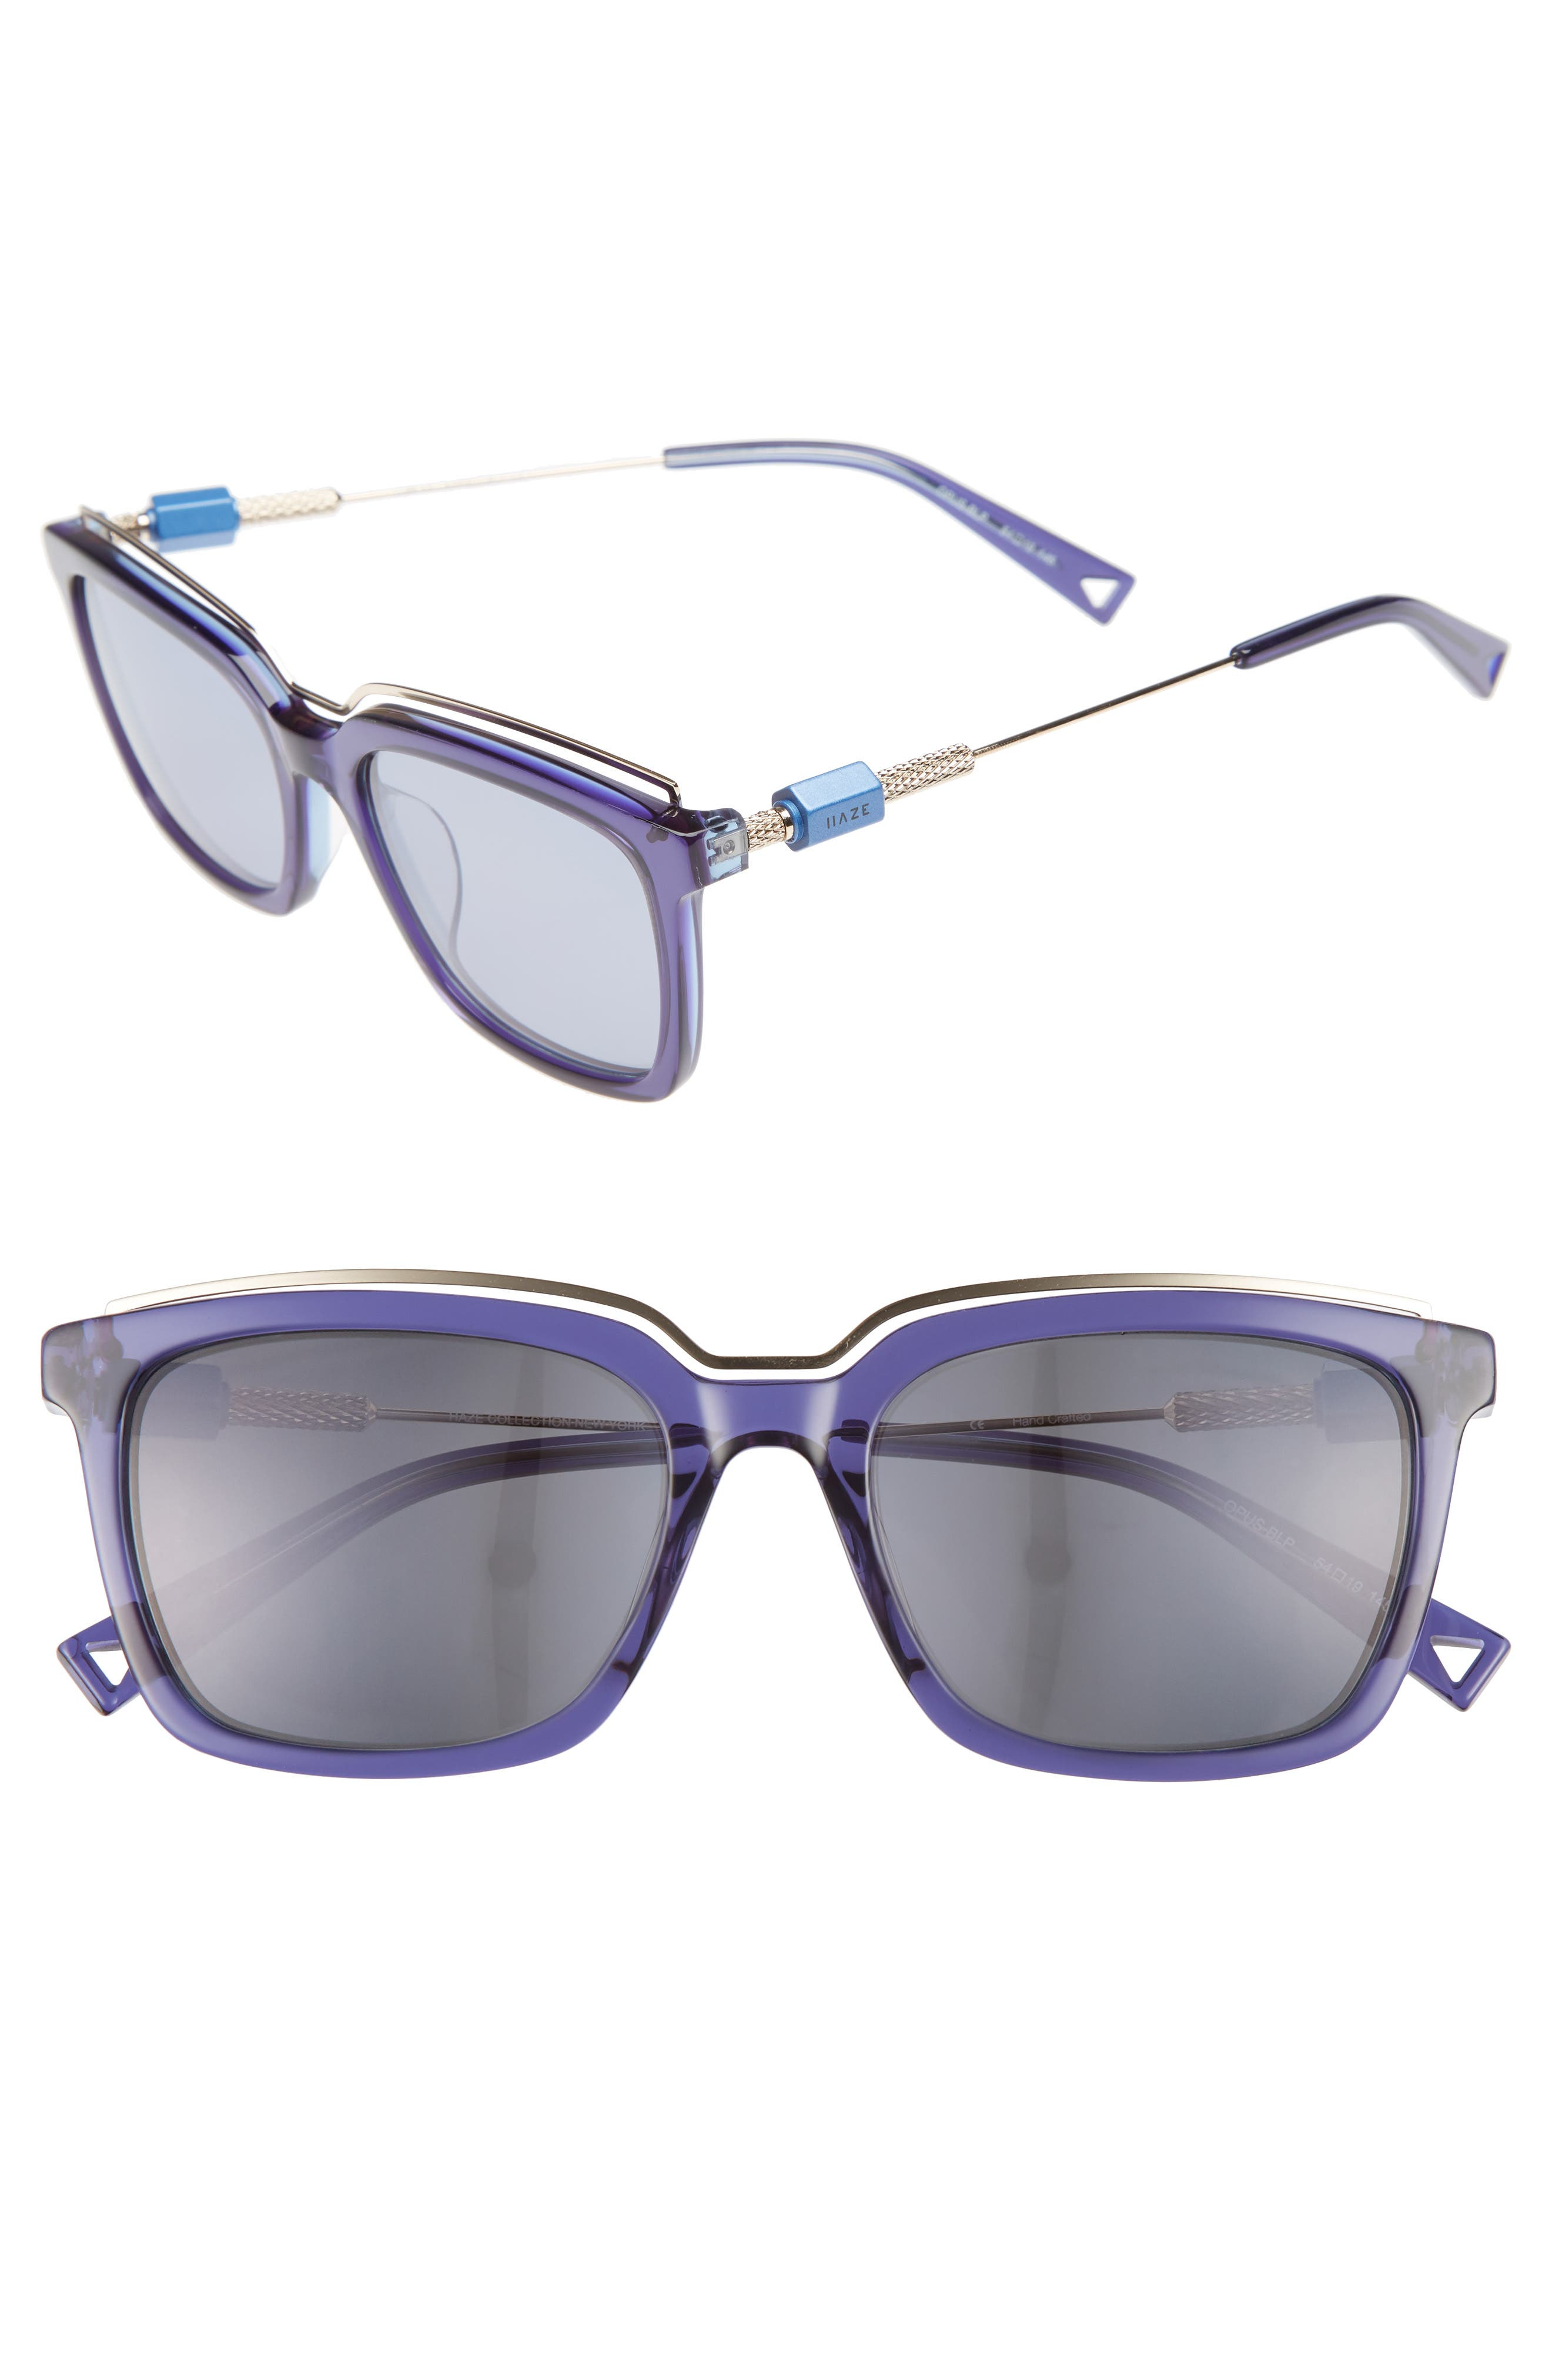 HAZE Opus 54mm Sunglasses